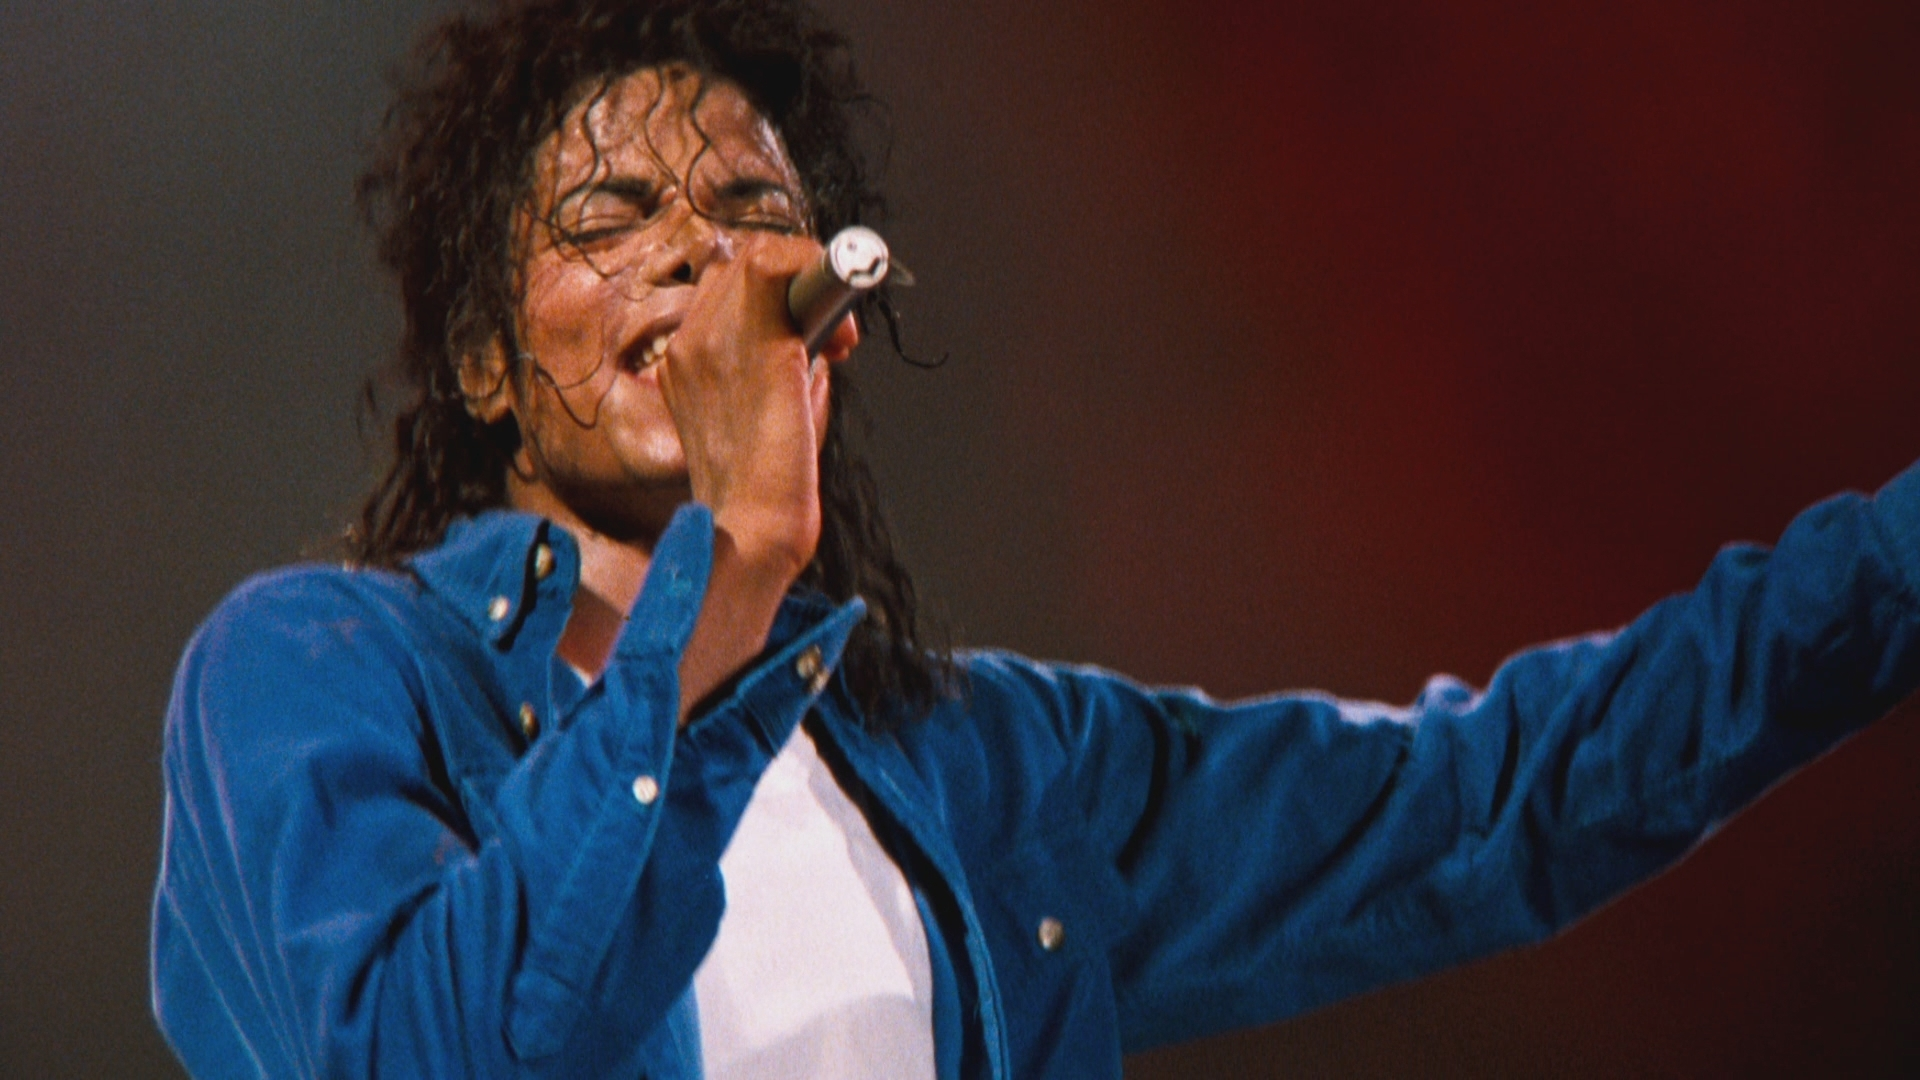 Michael Jackson 31 Widescreen Wallpaper